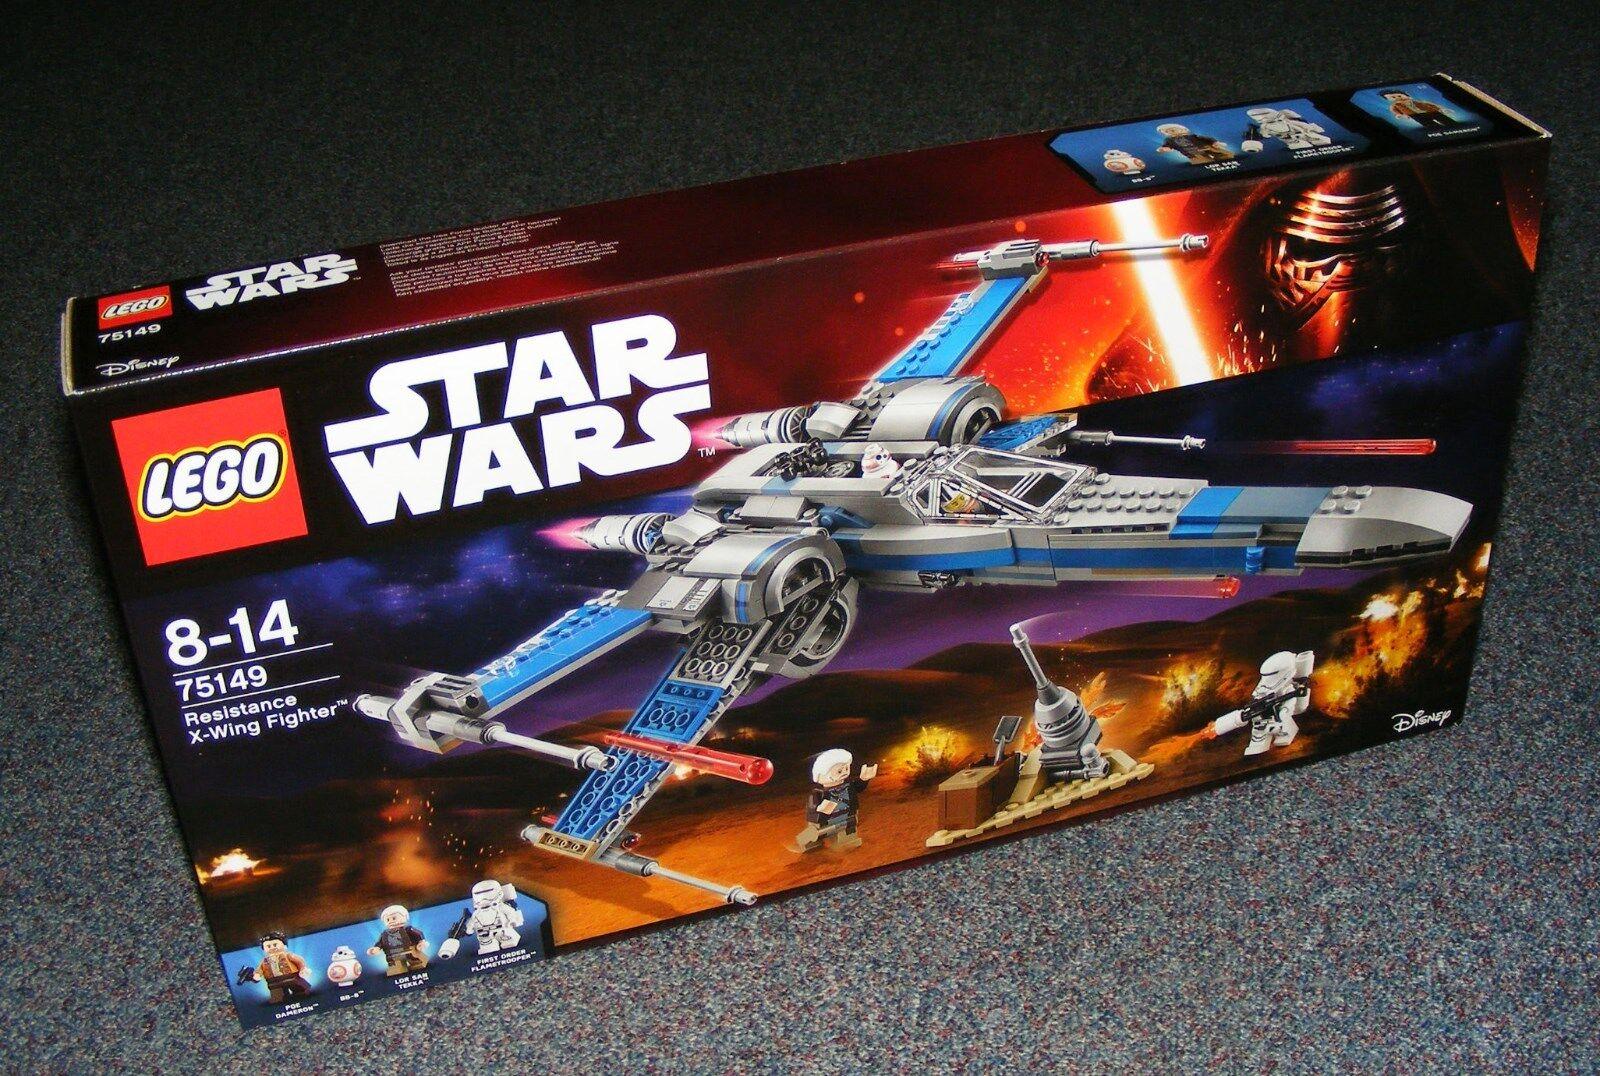 STAR WARS LEGO 75149 RESISTANCE X-WING FIGHTER BRAND NEW SEALED BNIB